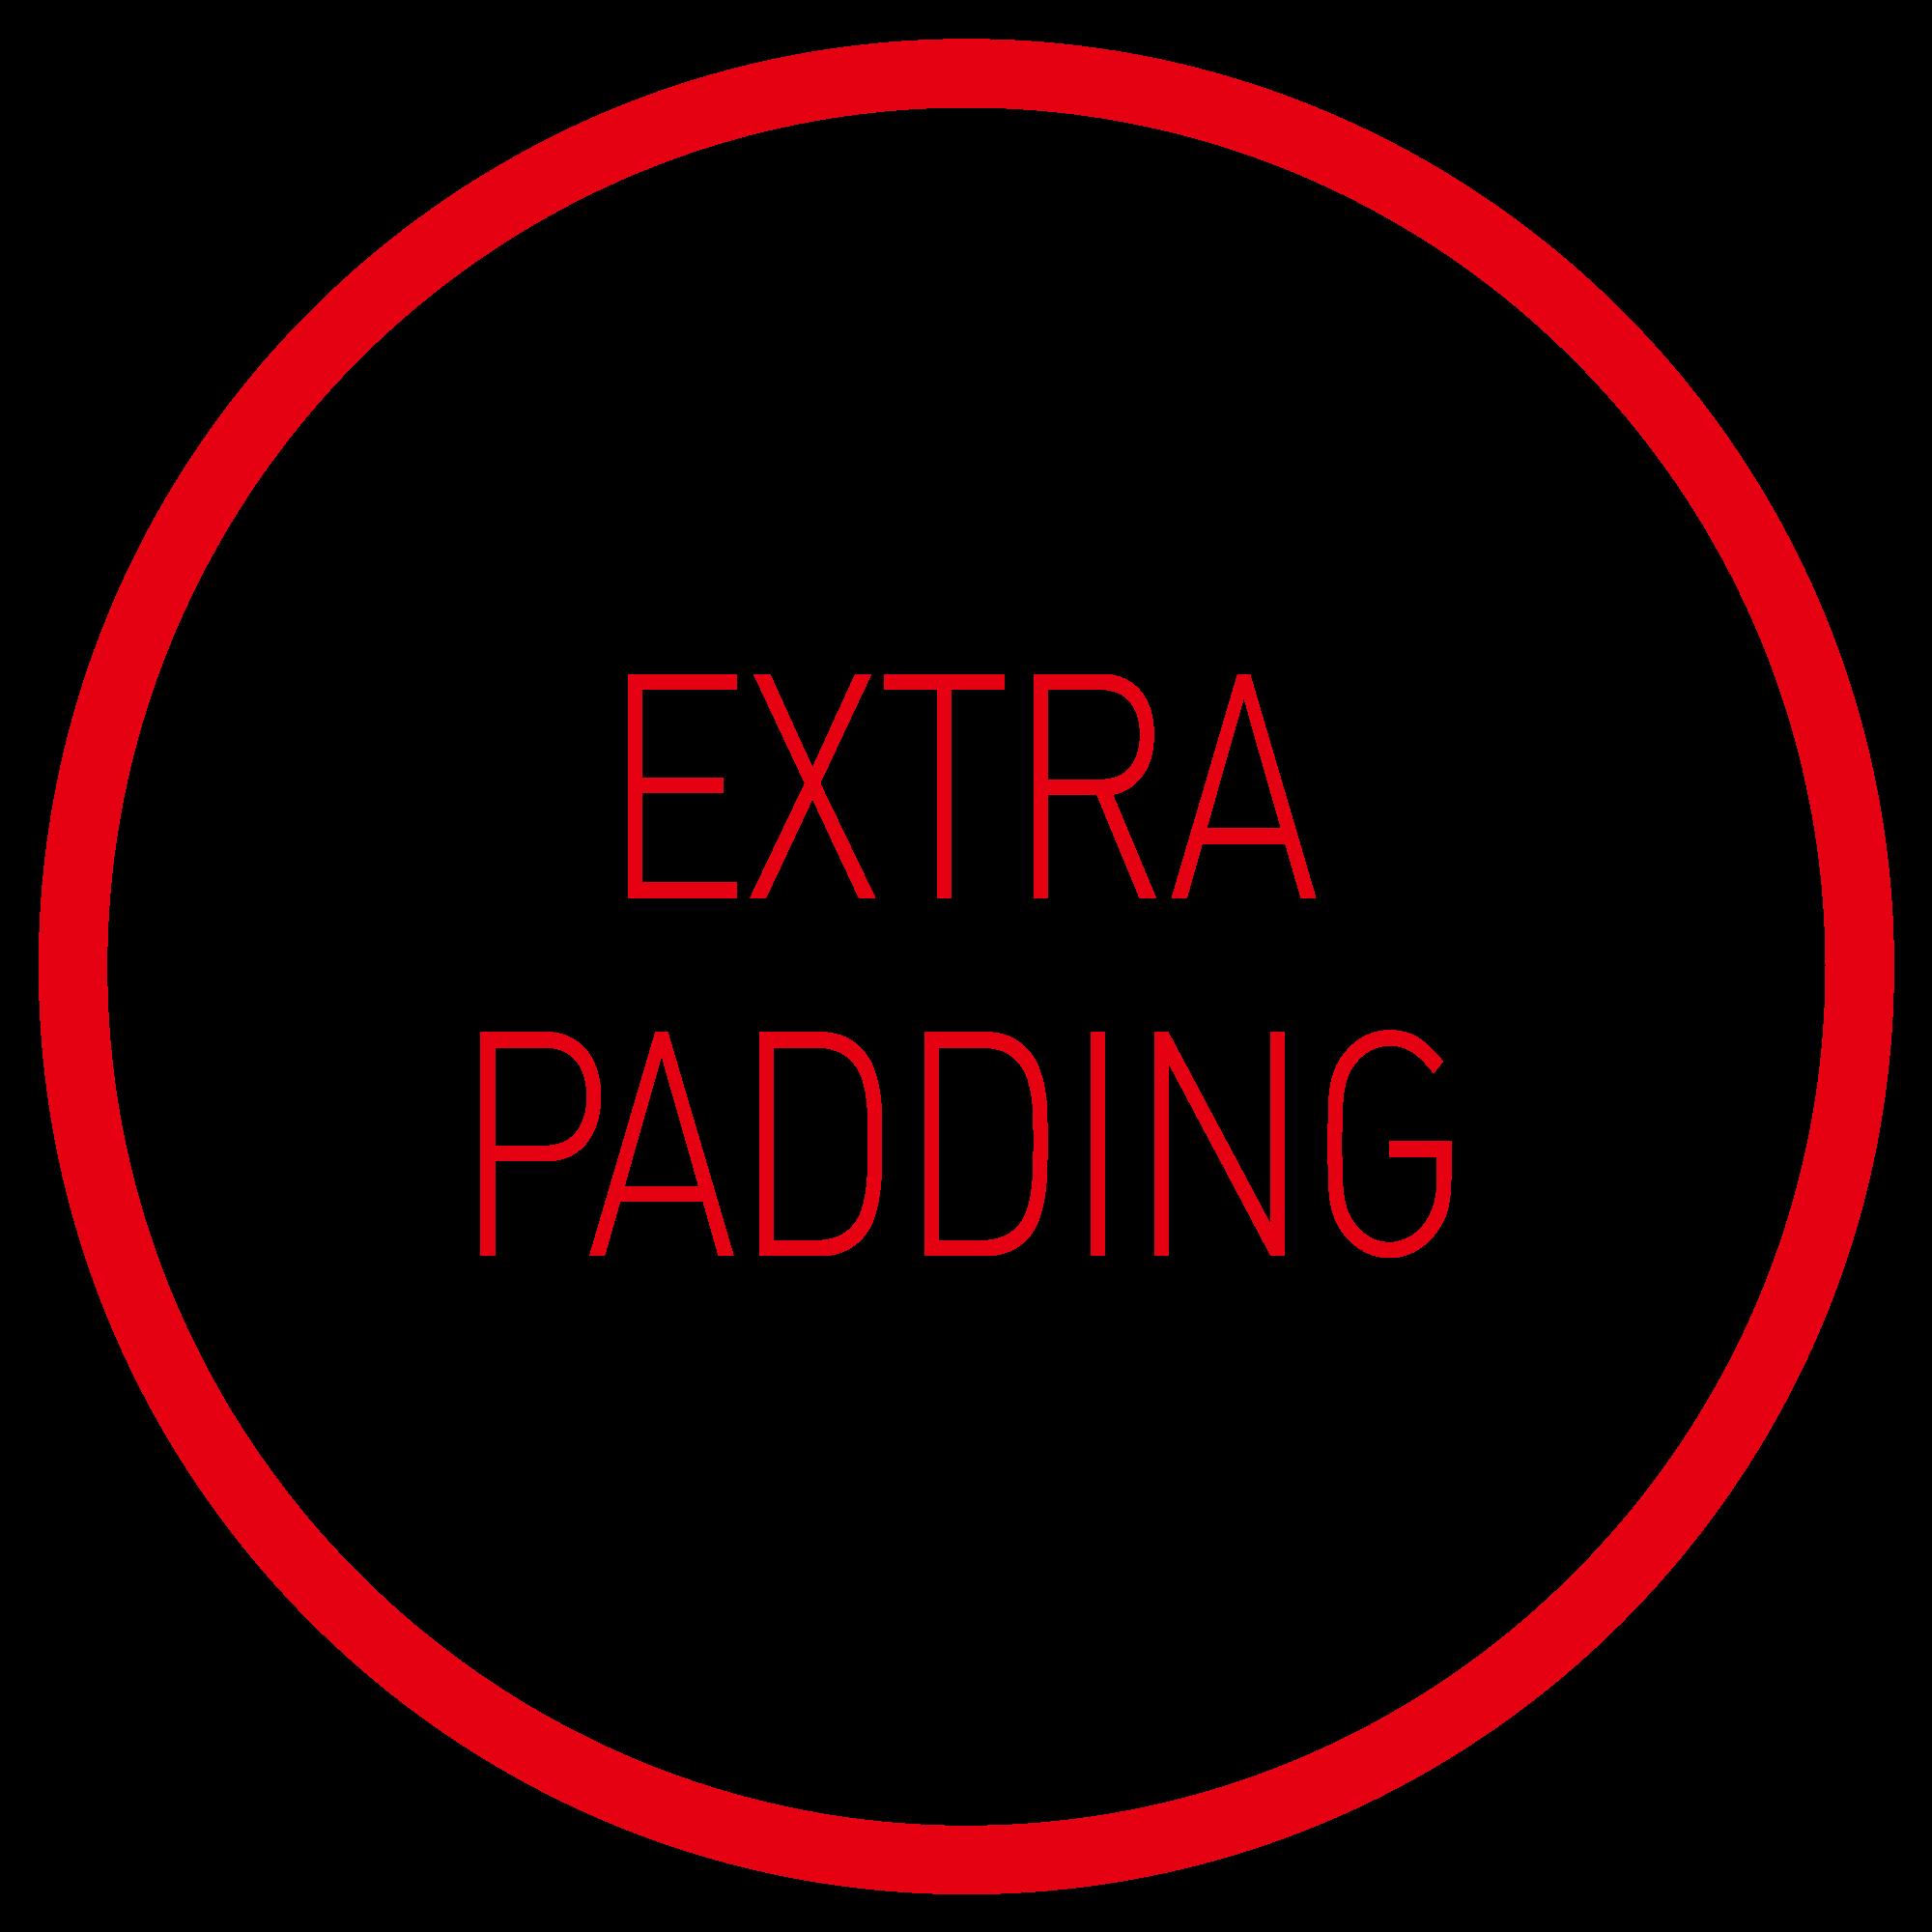 Selle-Italia-icon-07-extra-padding